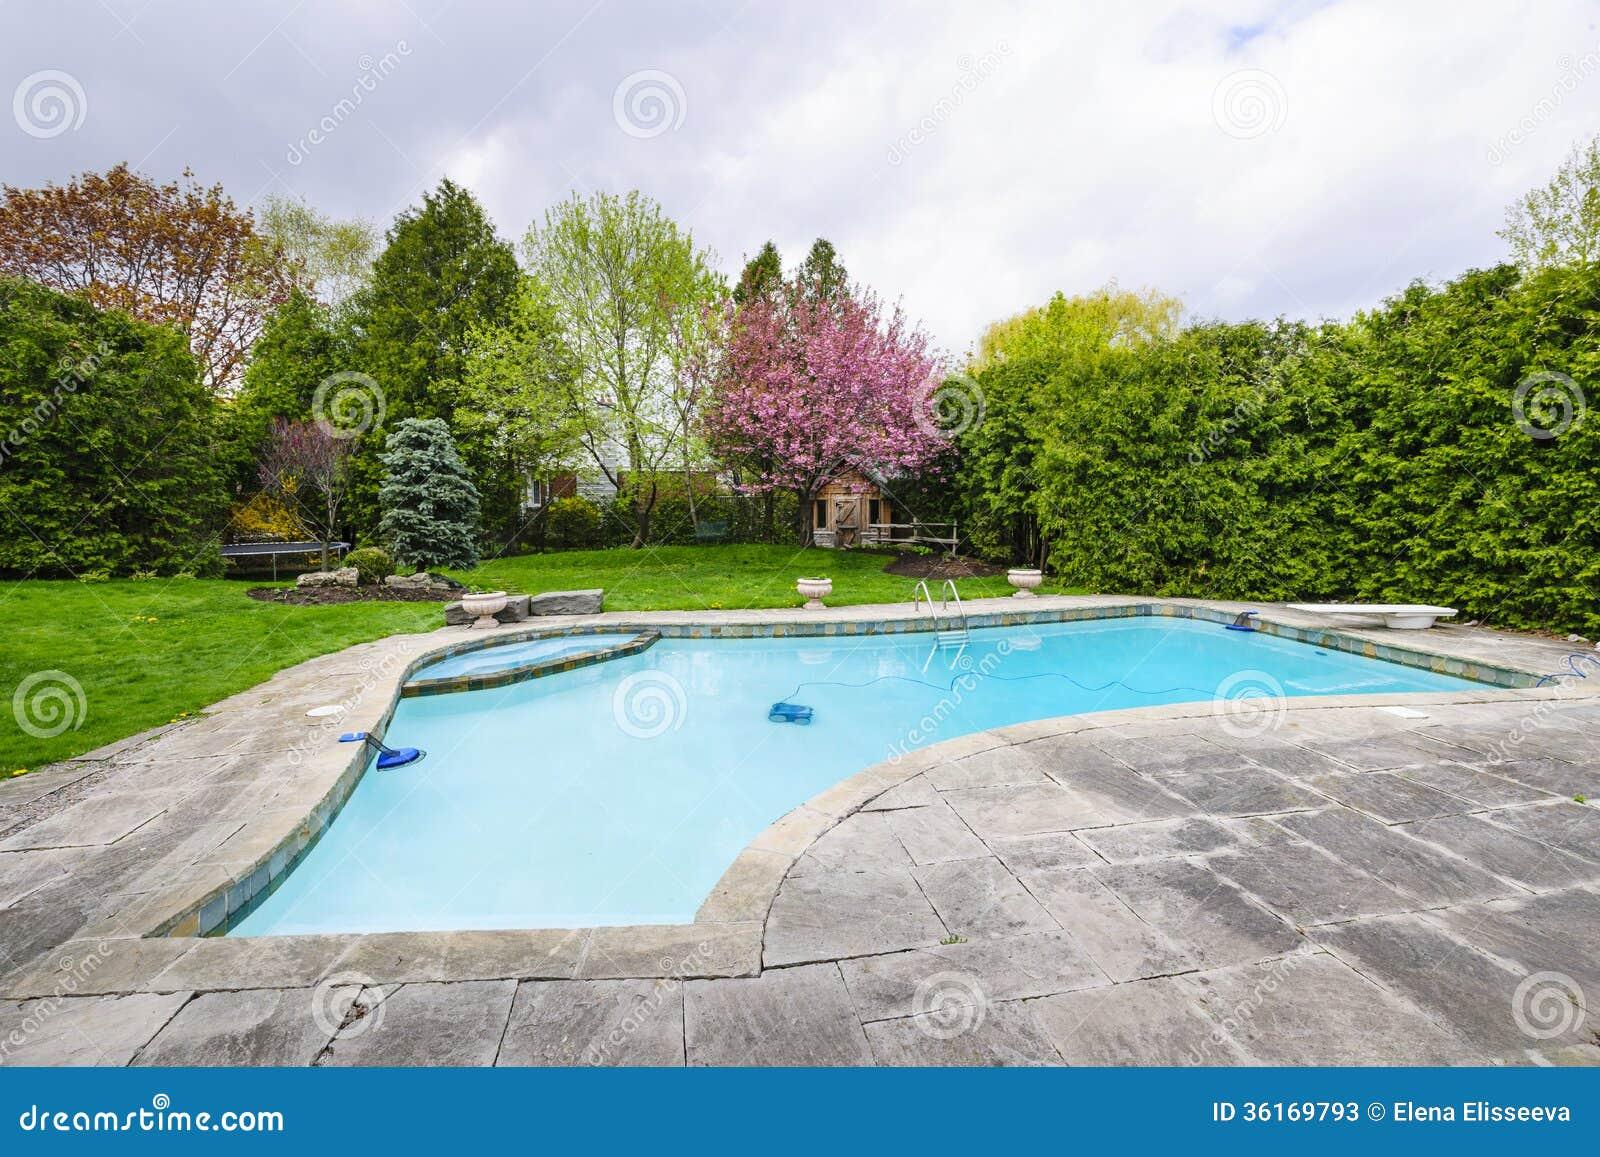 Swimming Pool In Backyard Stock Photos Image 36169793